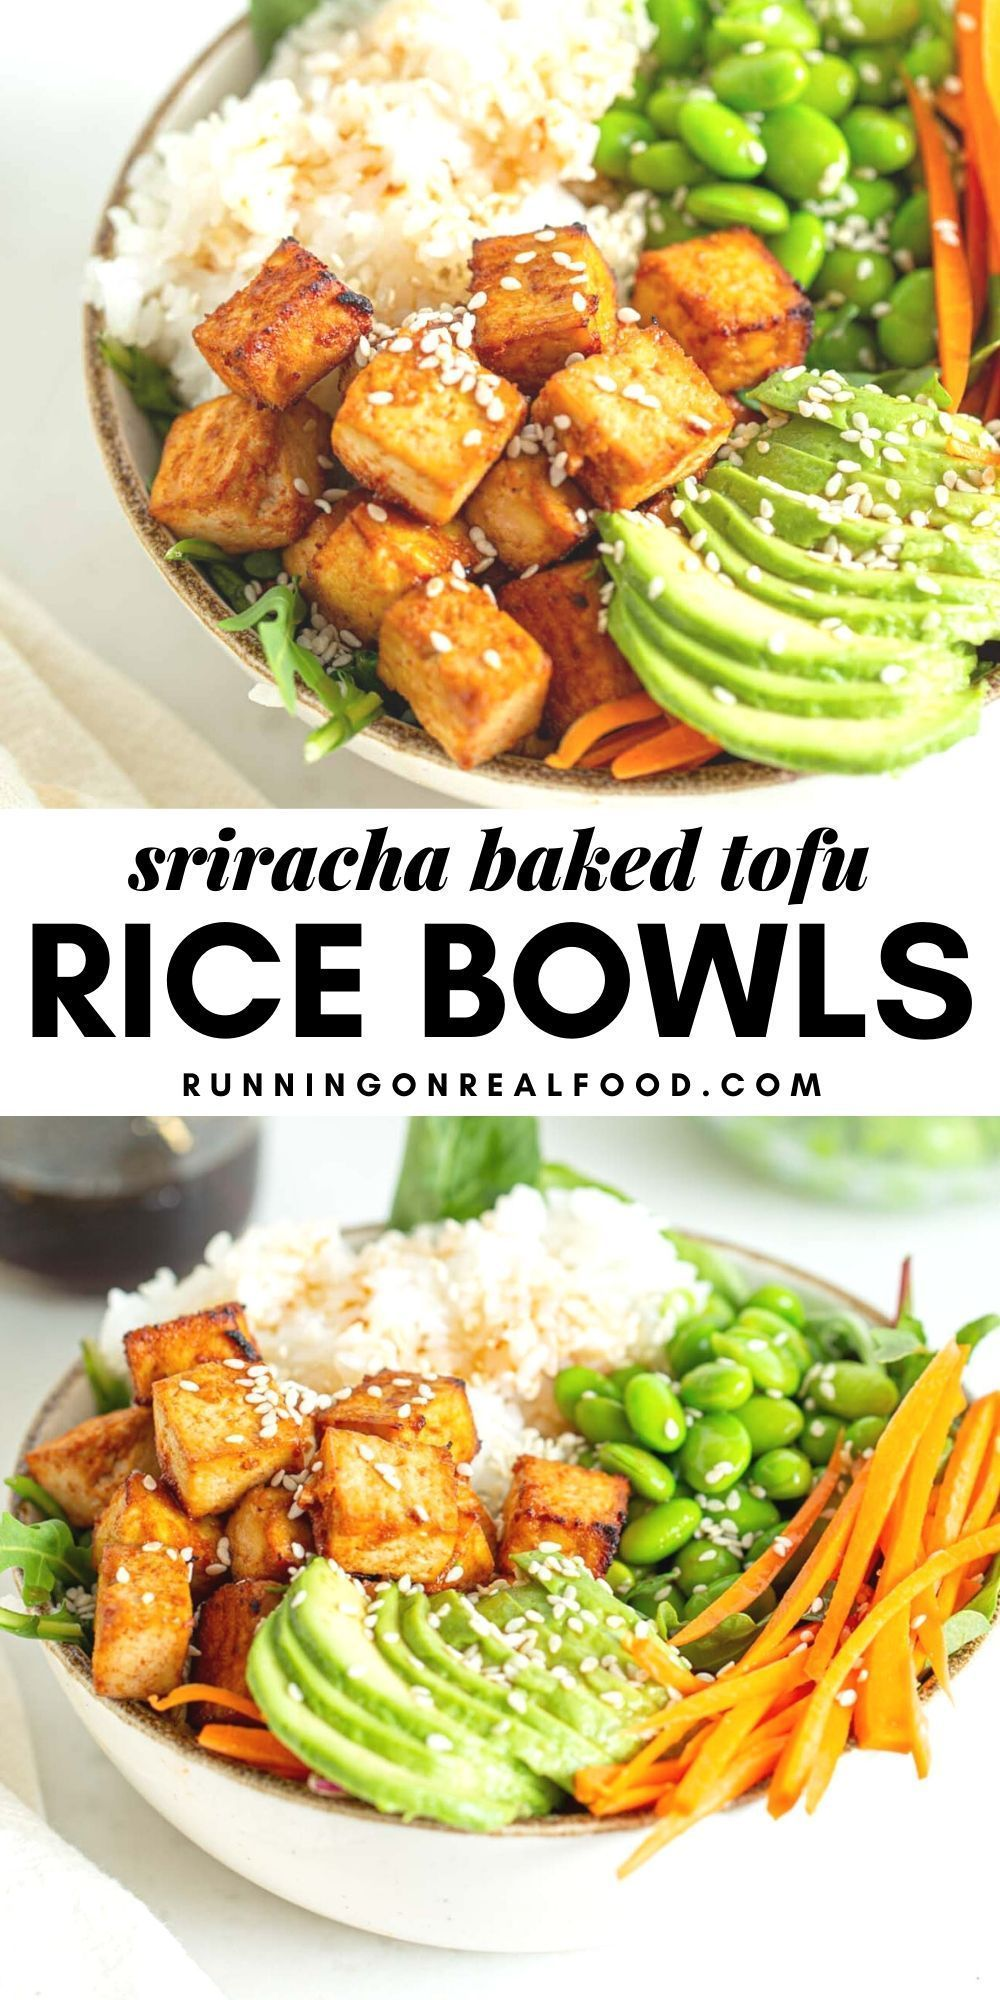 Sriracha Baked Tofu Rice Bowls Recipe In 2020 Rice Bowls Recipes Tofu Veggie Recipes